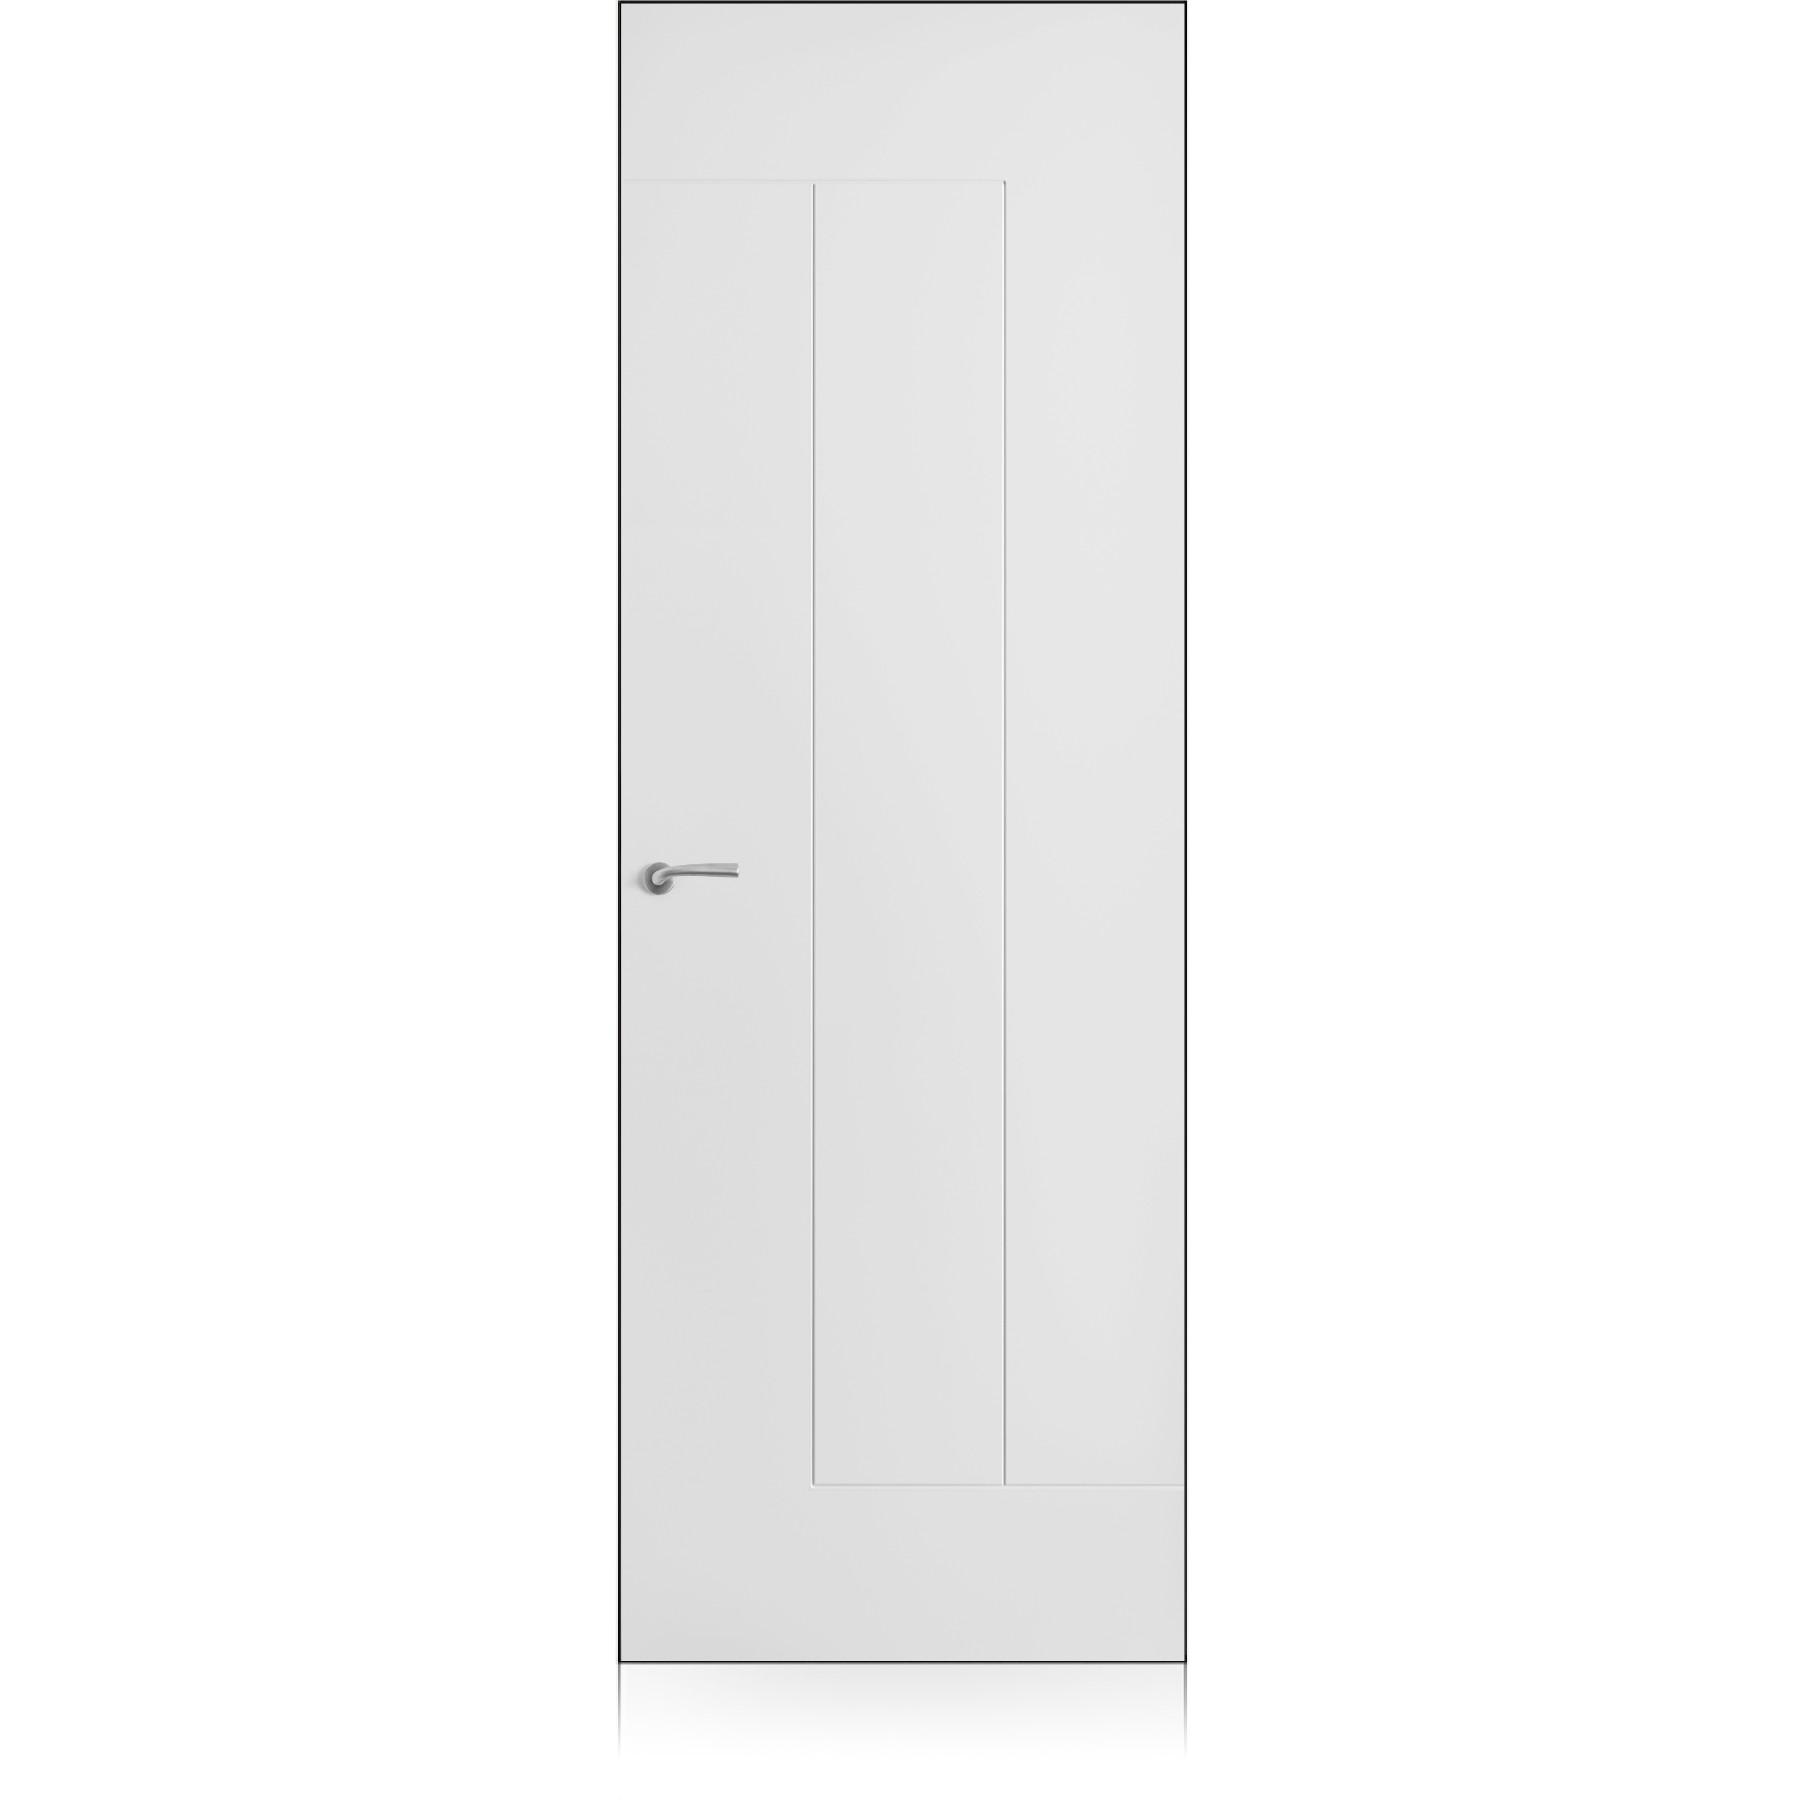 Yncisa/8 Zero bianco optical door